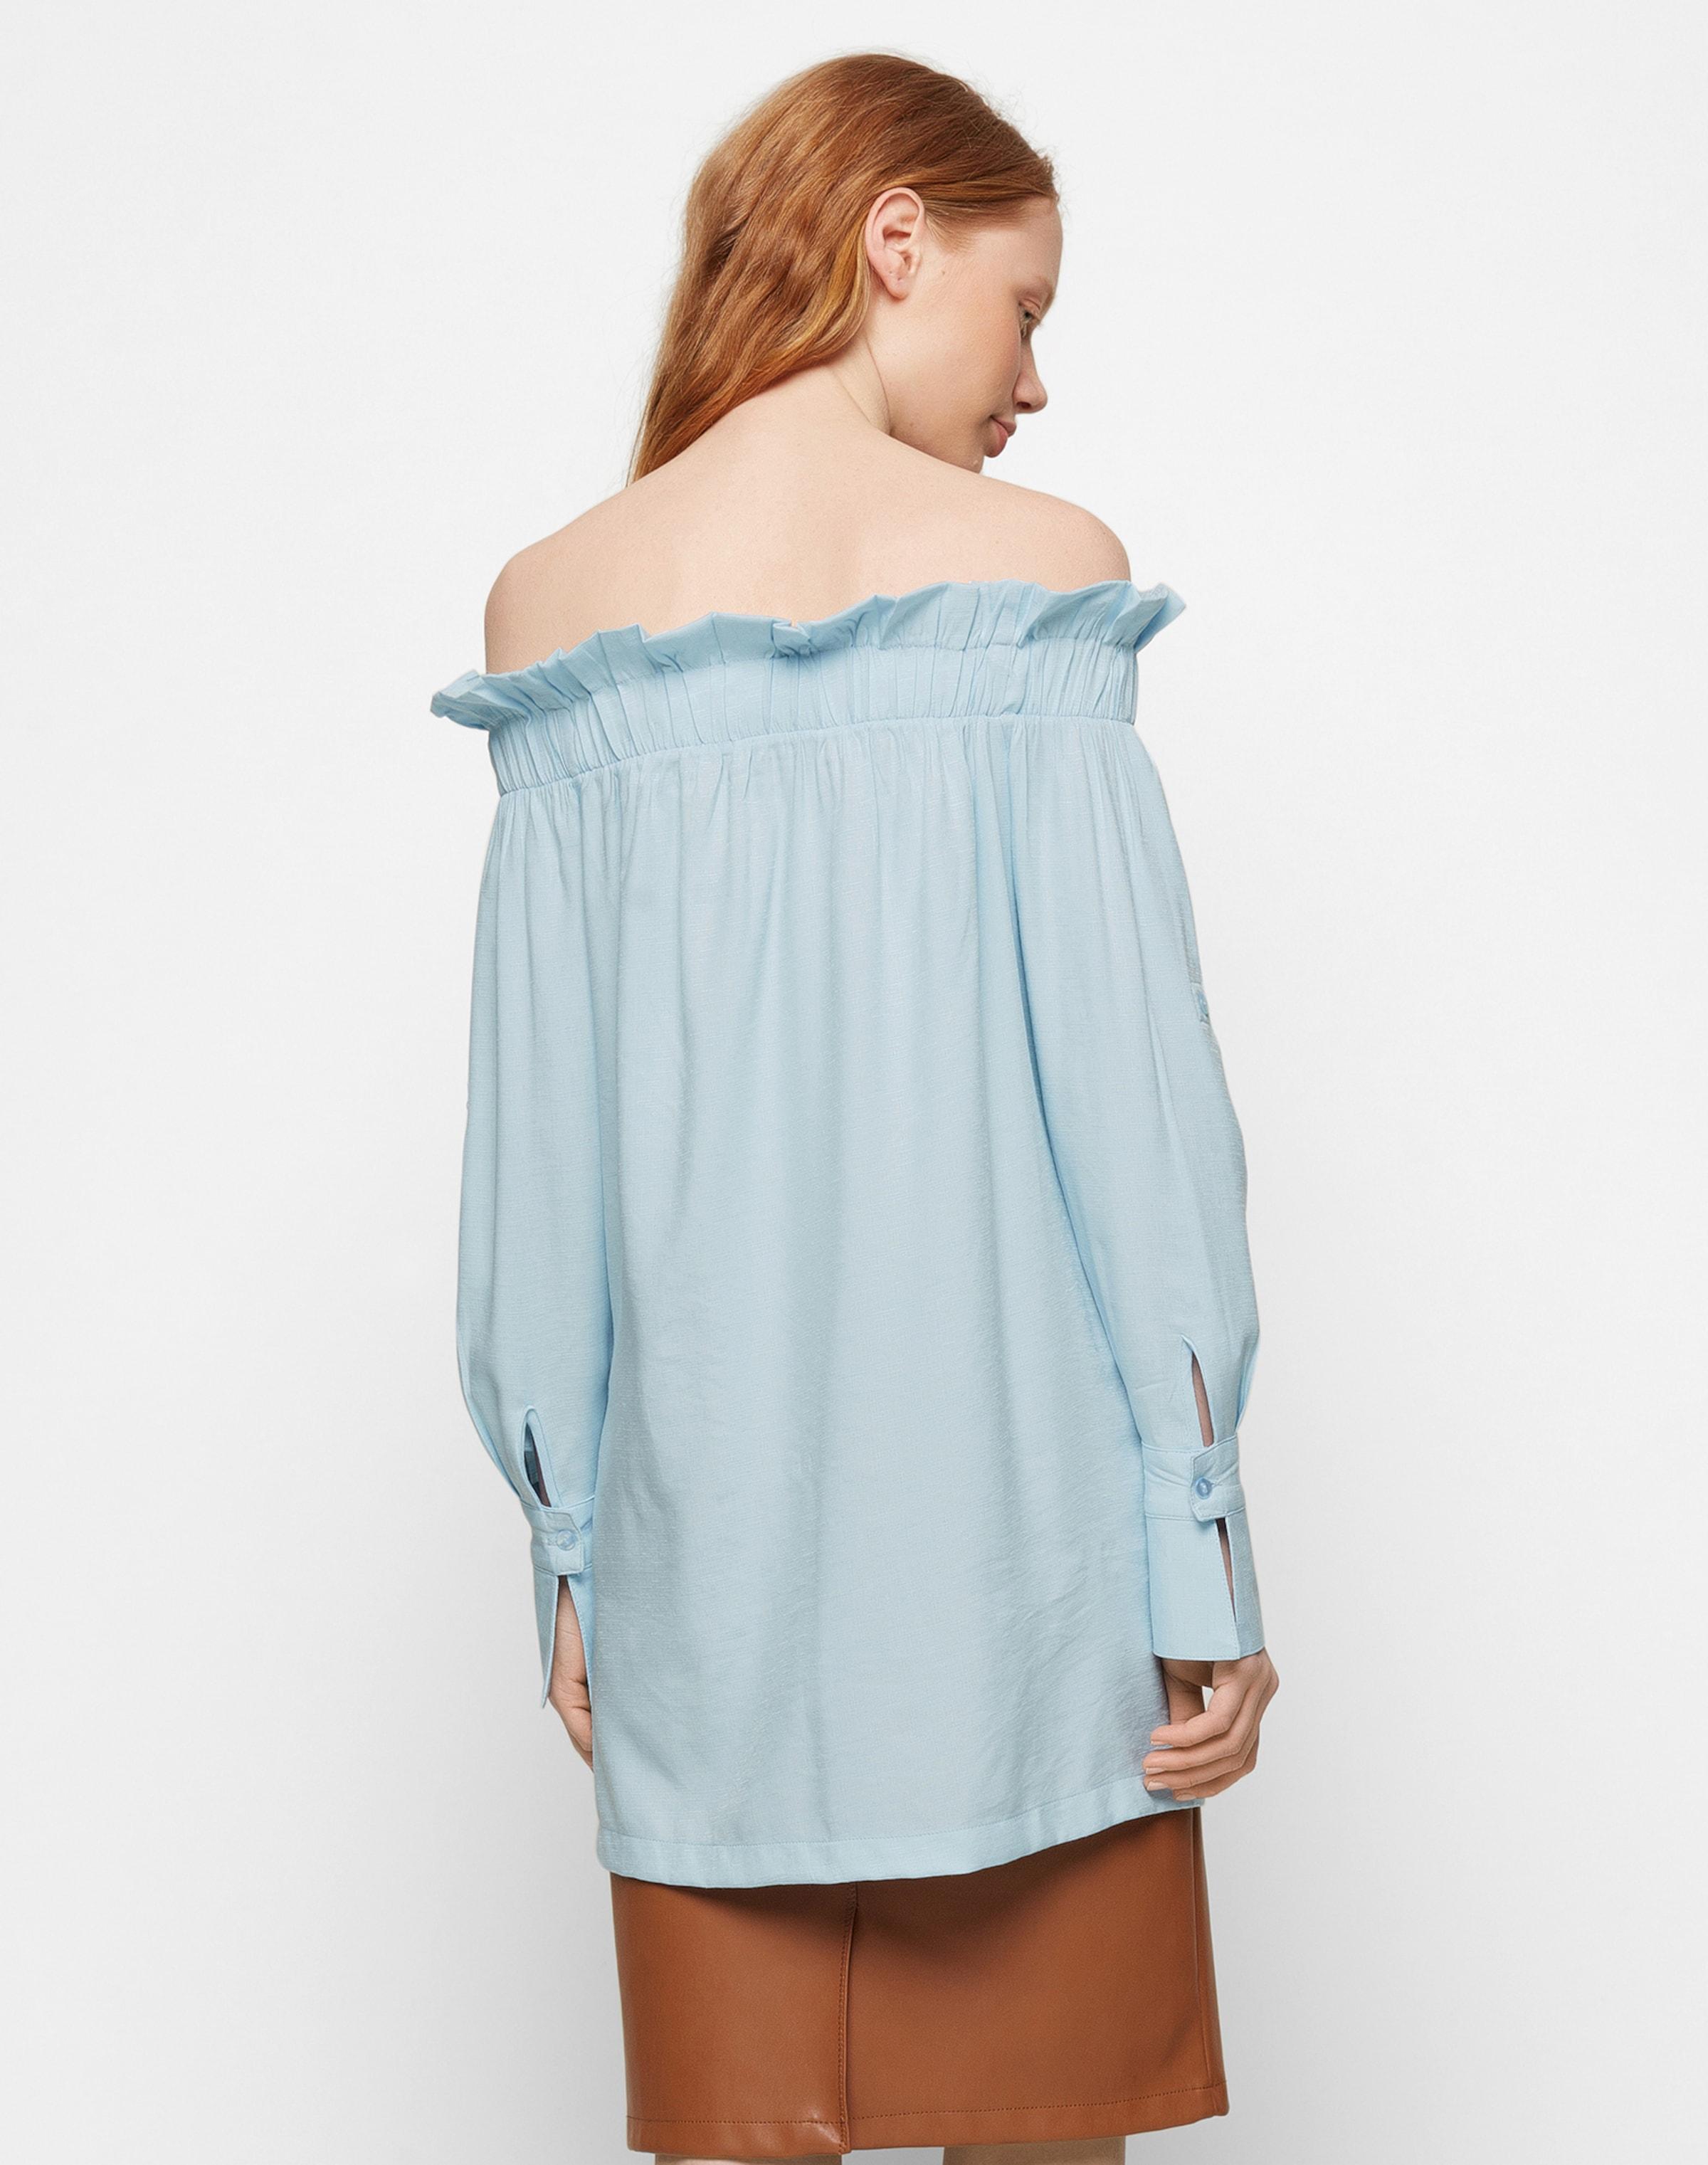 Off MINKPINK Off Off Kleid Shoulder MINKPINK Off MINKPINK Shoulder Shoulder Shoulder Kleid MINKPINK Kleid Kleid 7FFUqwR